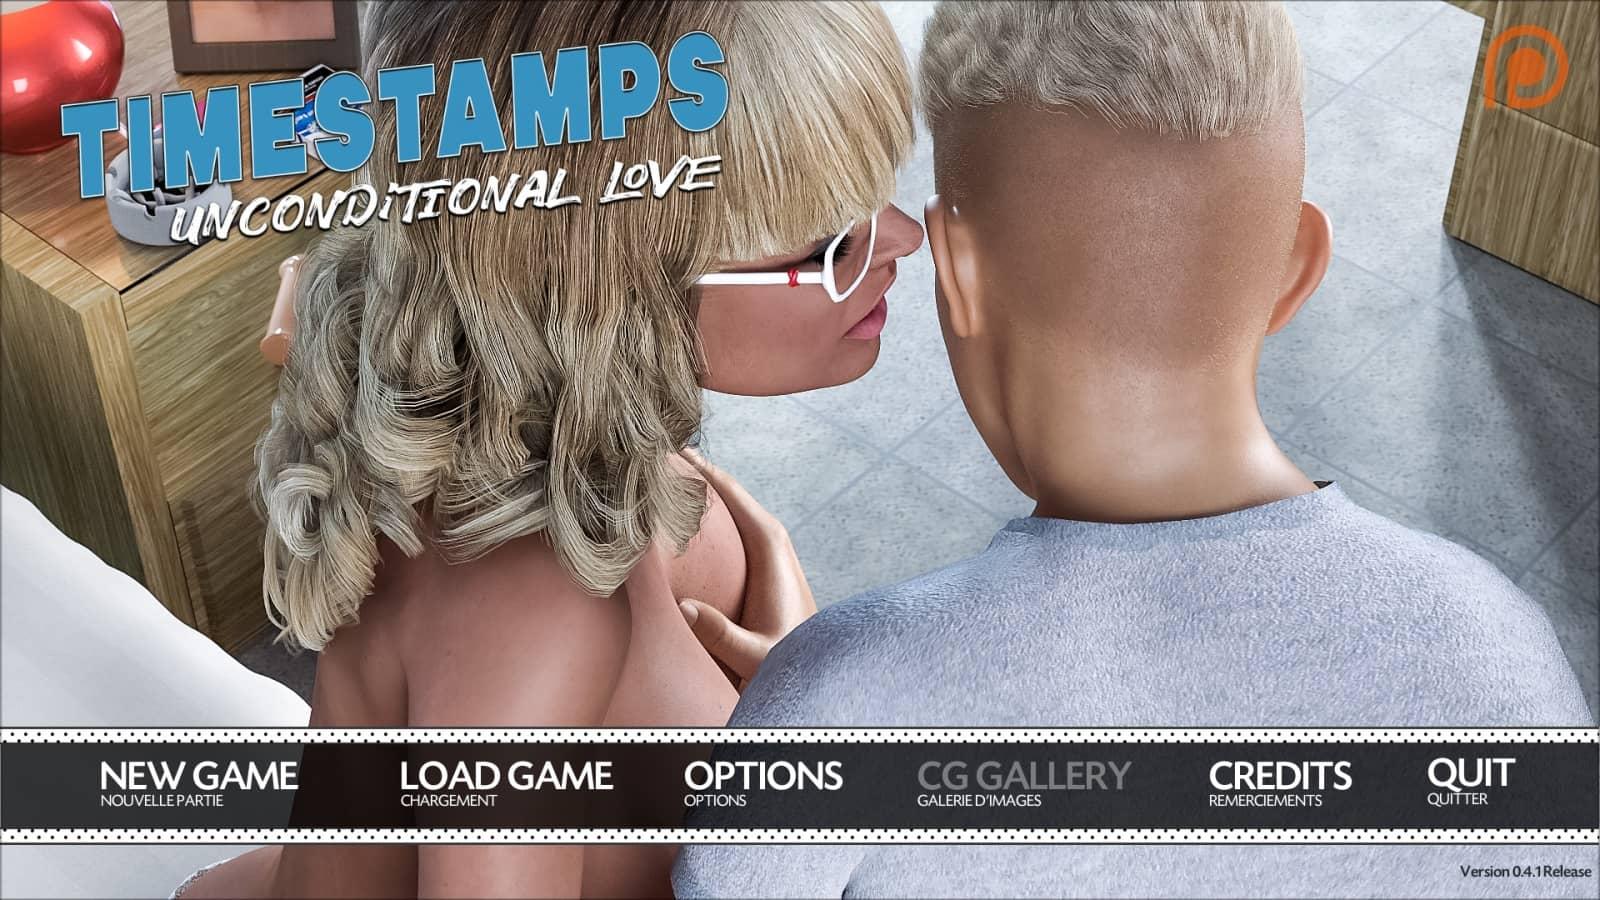 [Motkeyz Games]Timestamps, Unconditional Love 第一部